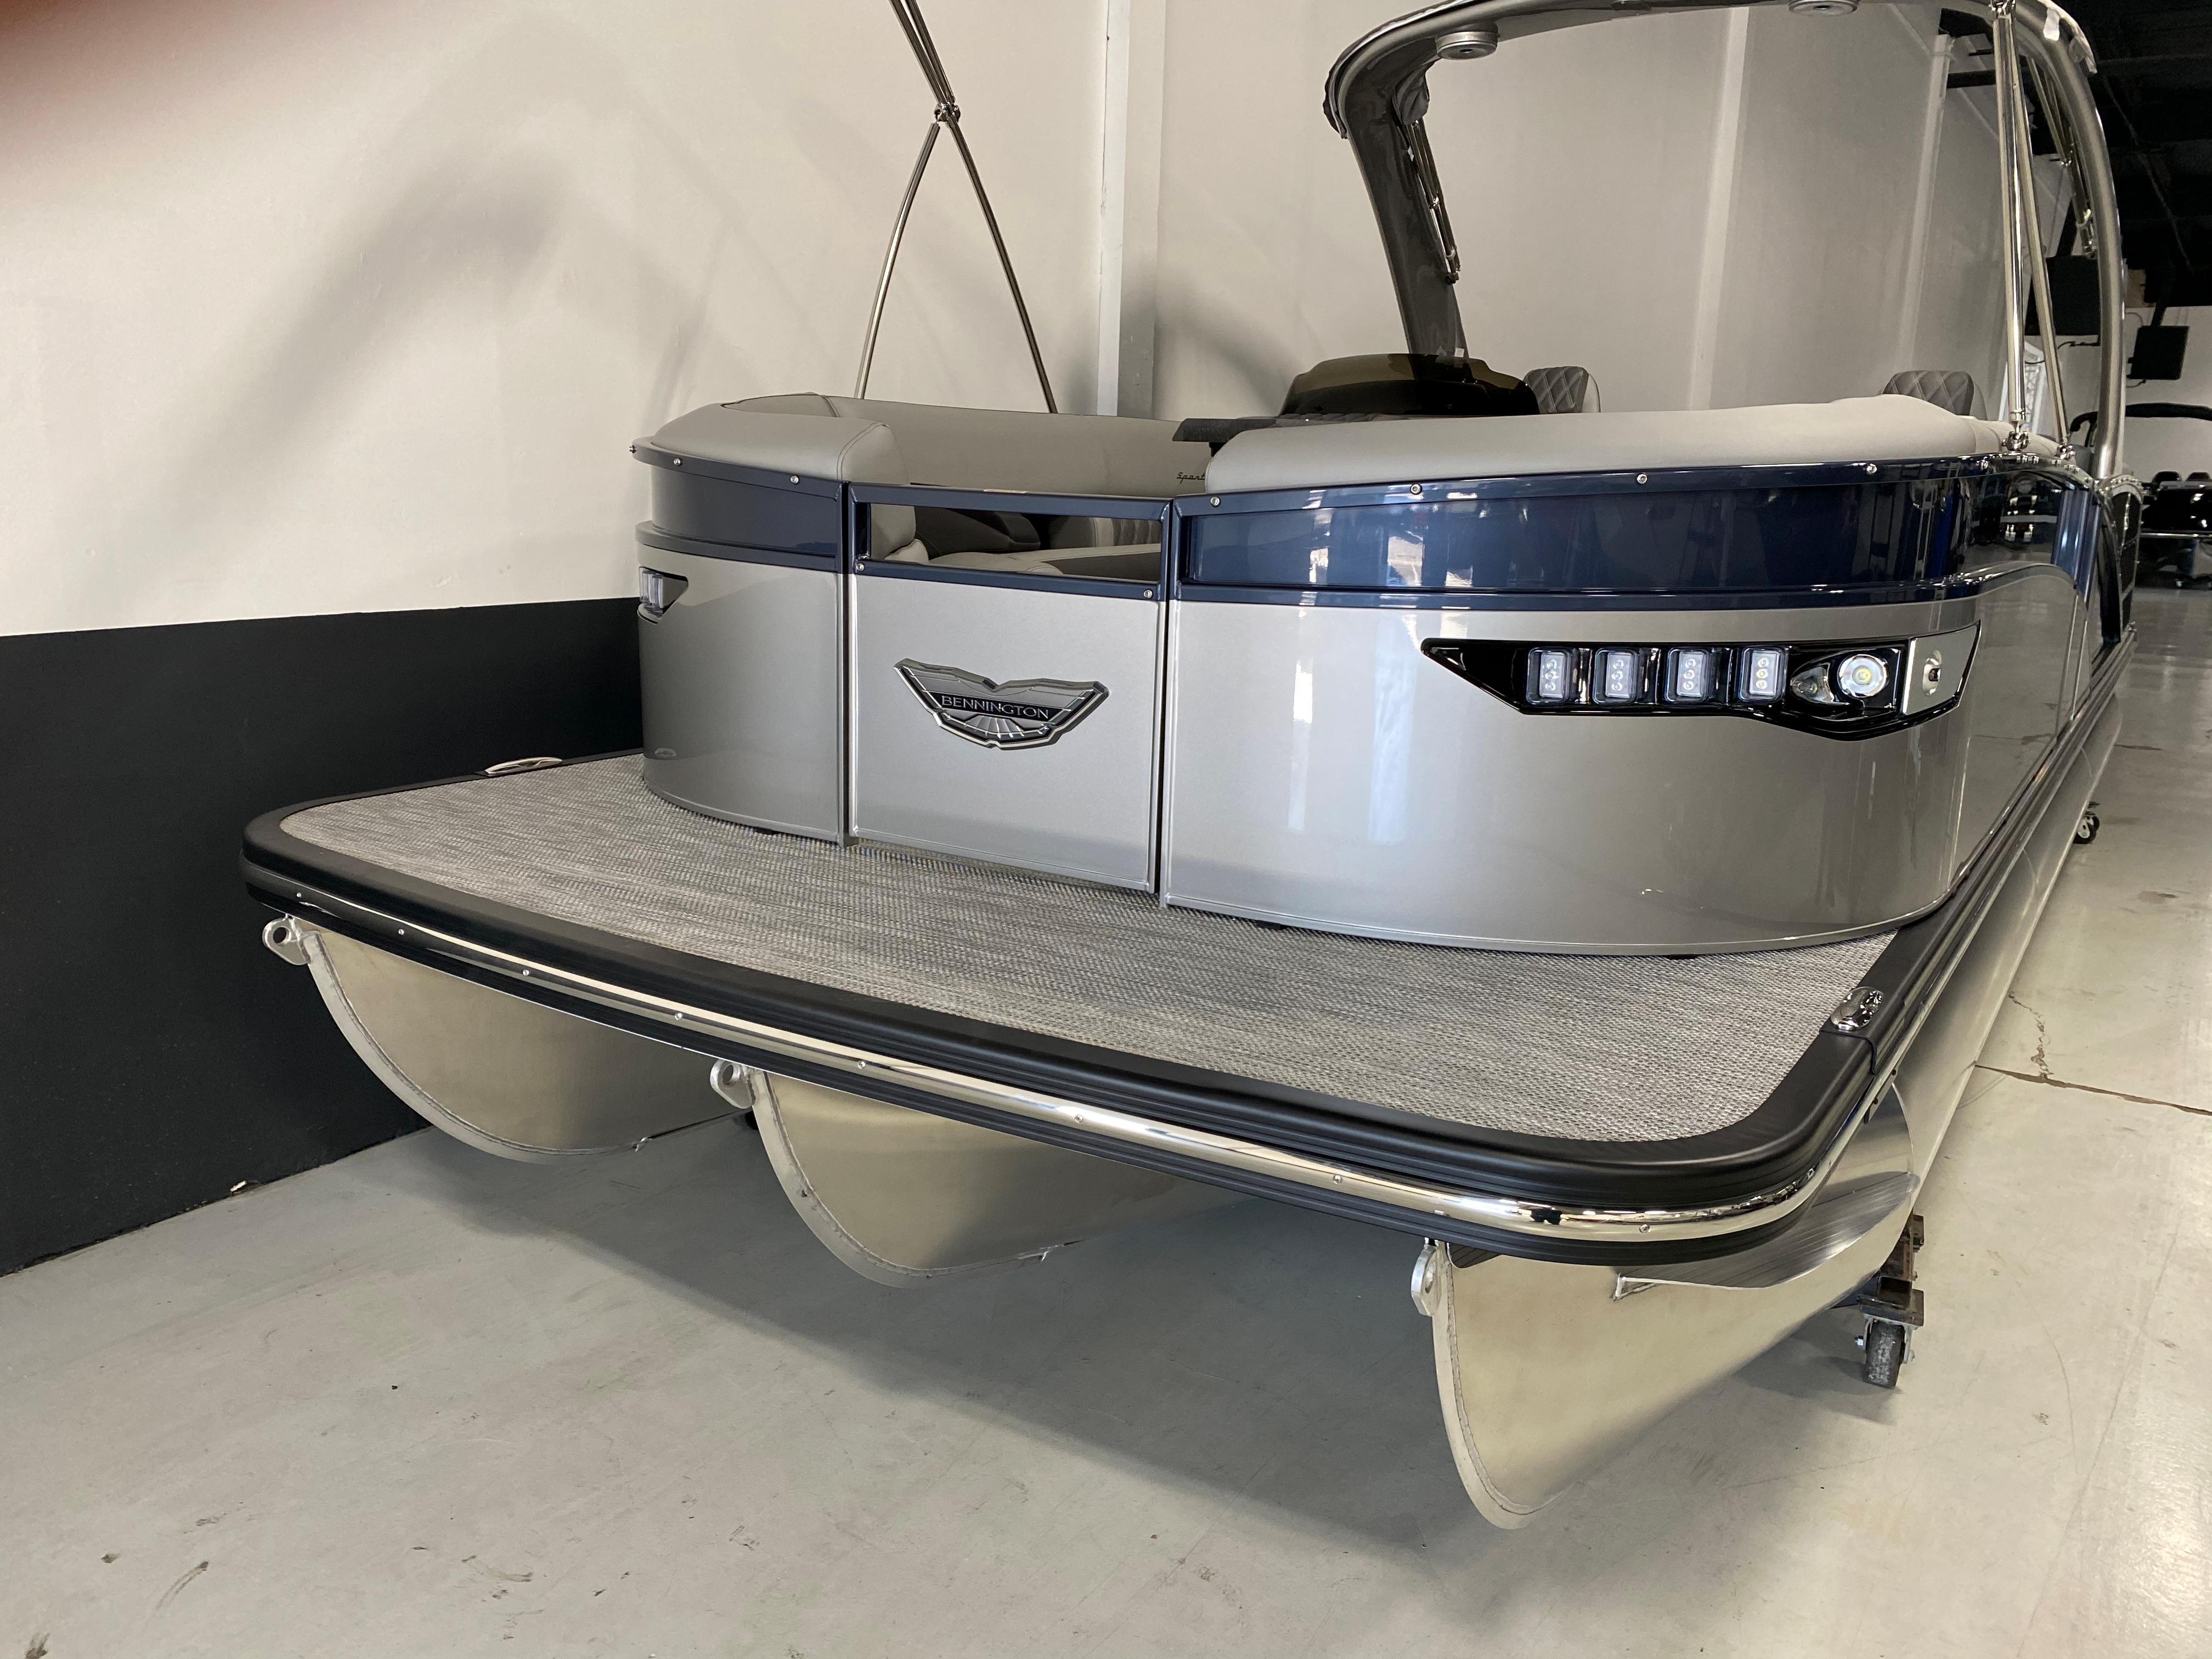 2021 Bennington 25 RXFBA #B8253K inventory image at Sun Country Inland in Lake Havasu City